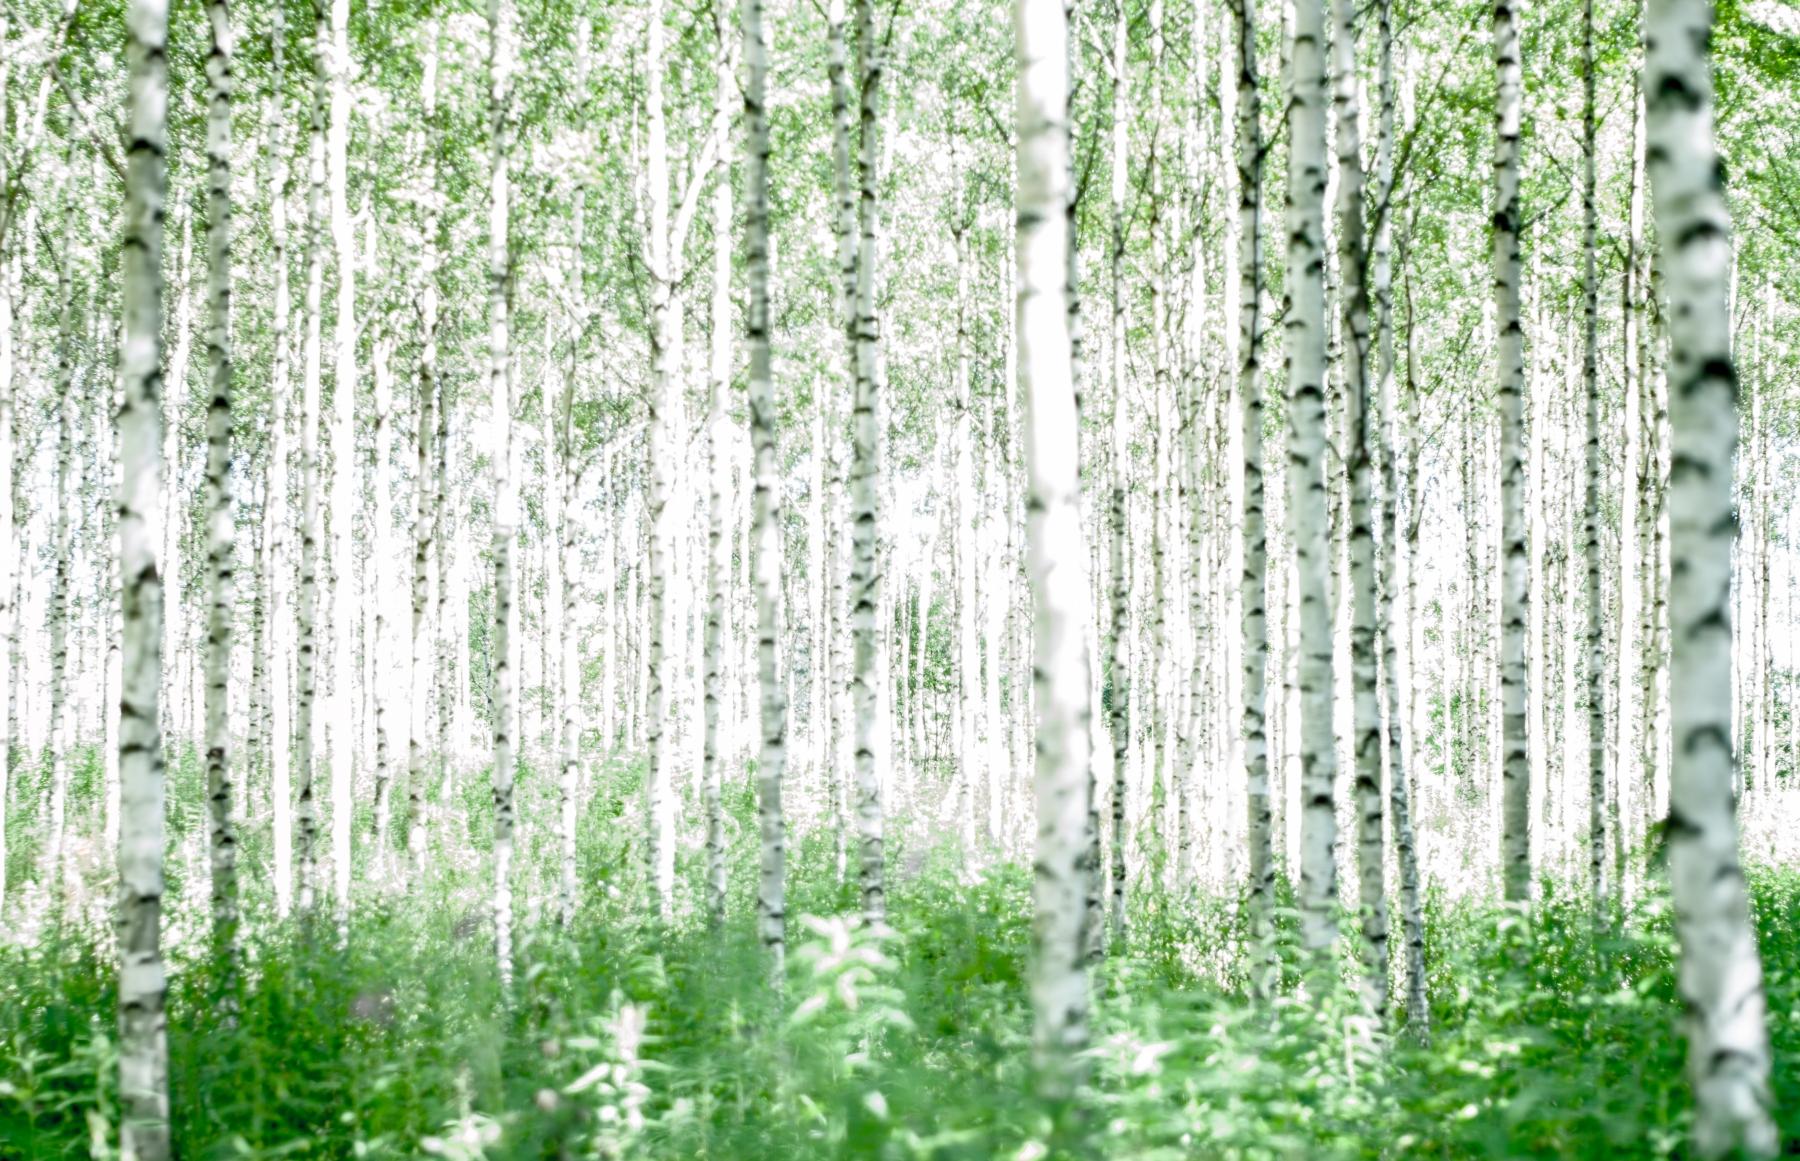 Kesusmaa, Norra Karelen